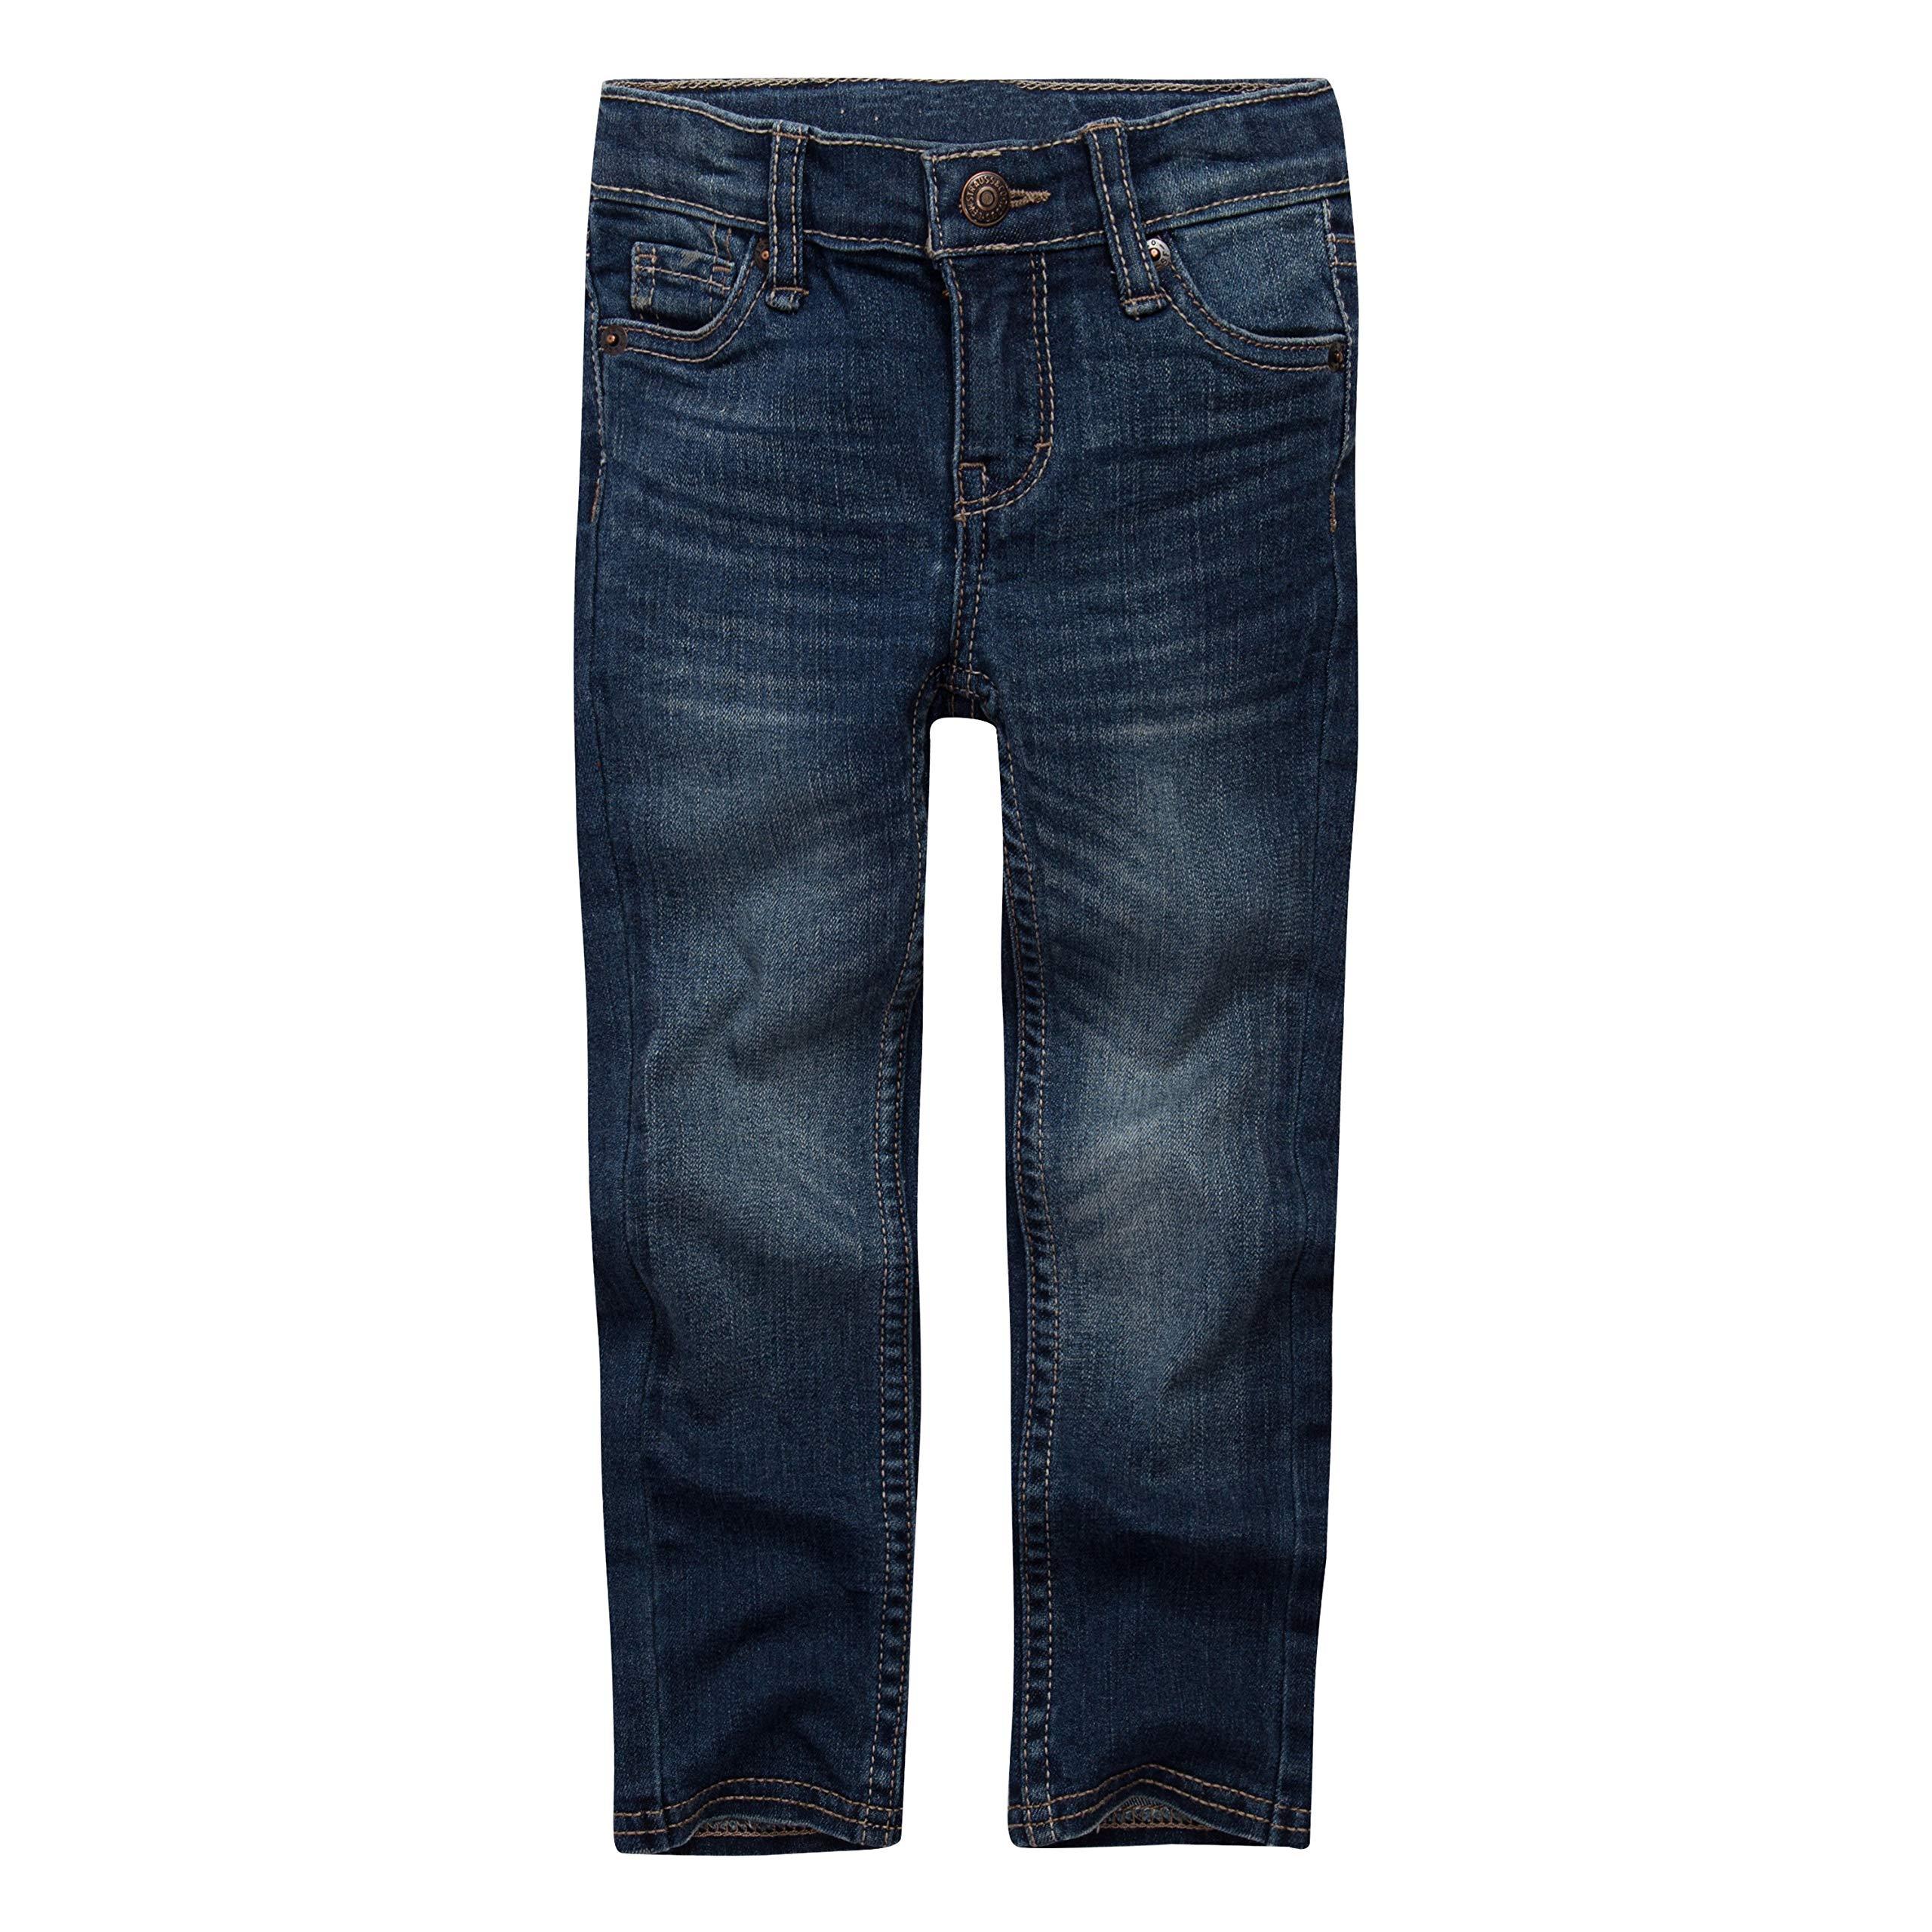 Levi's Girls' Big 711 Skinny Fit Jeans, Rockabilly, 16 by Levi's